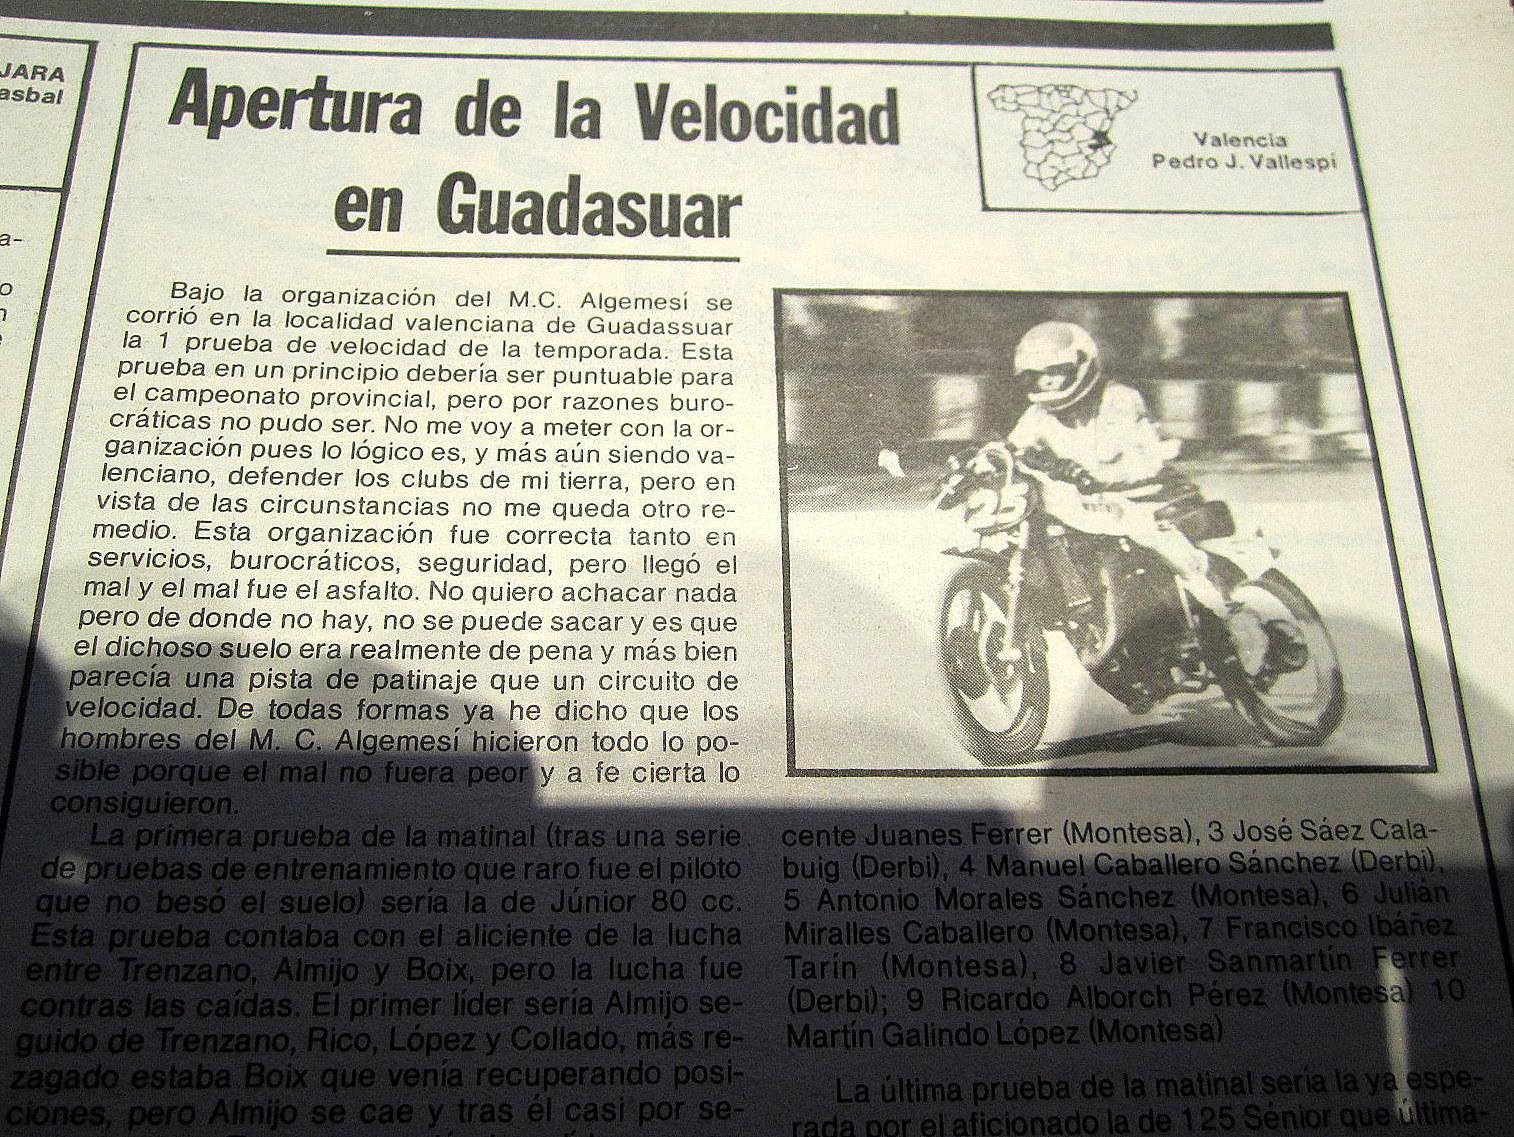 gilera - Antiguos pilotos: José Luis Gallego (V) 2vhxf2s